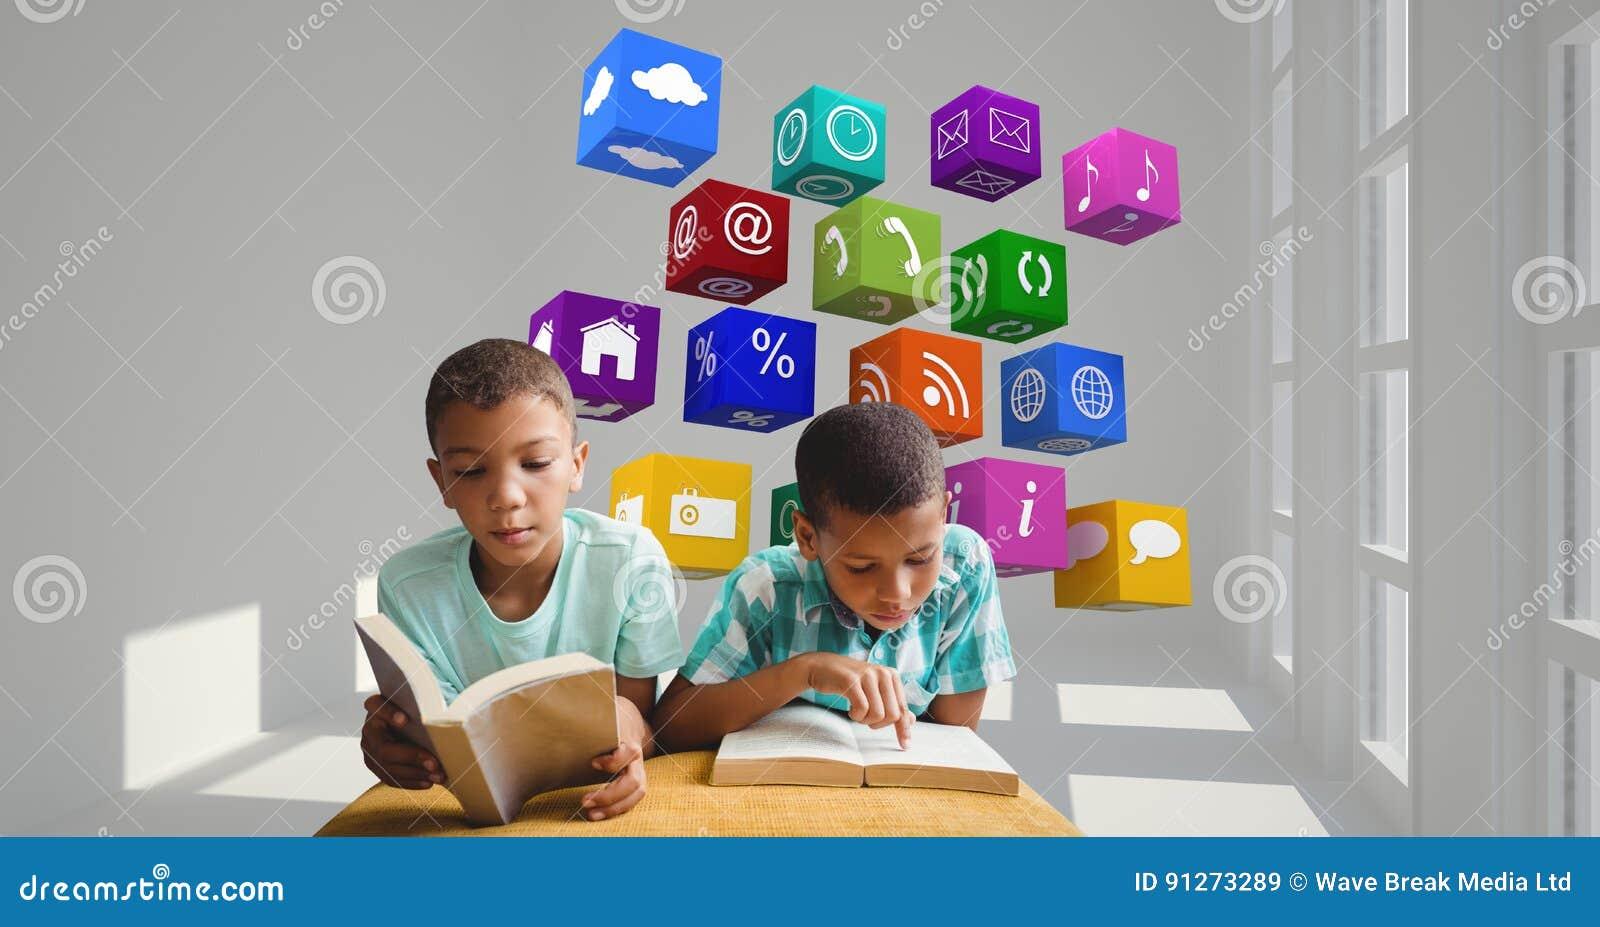 application for reading books